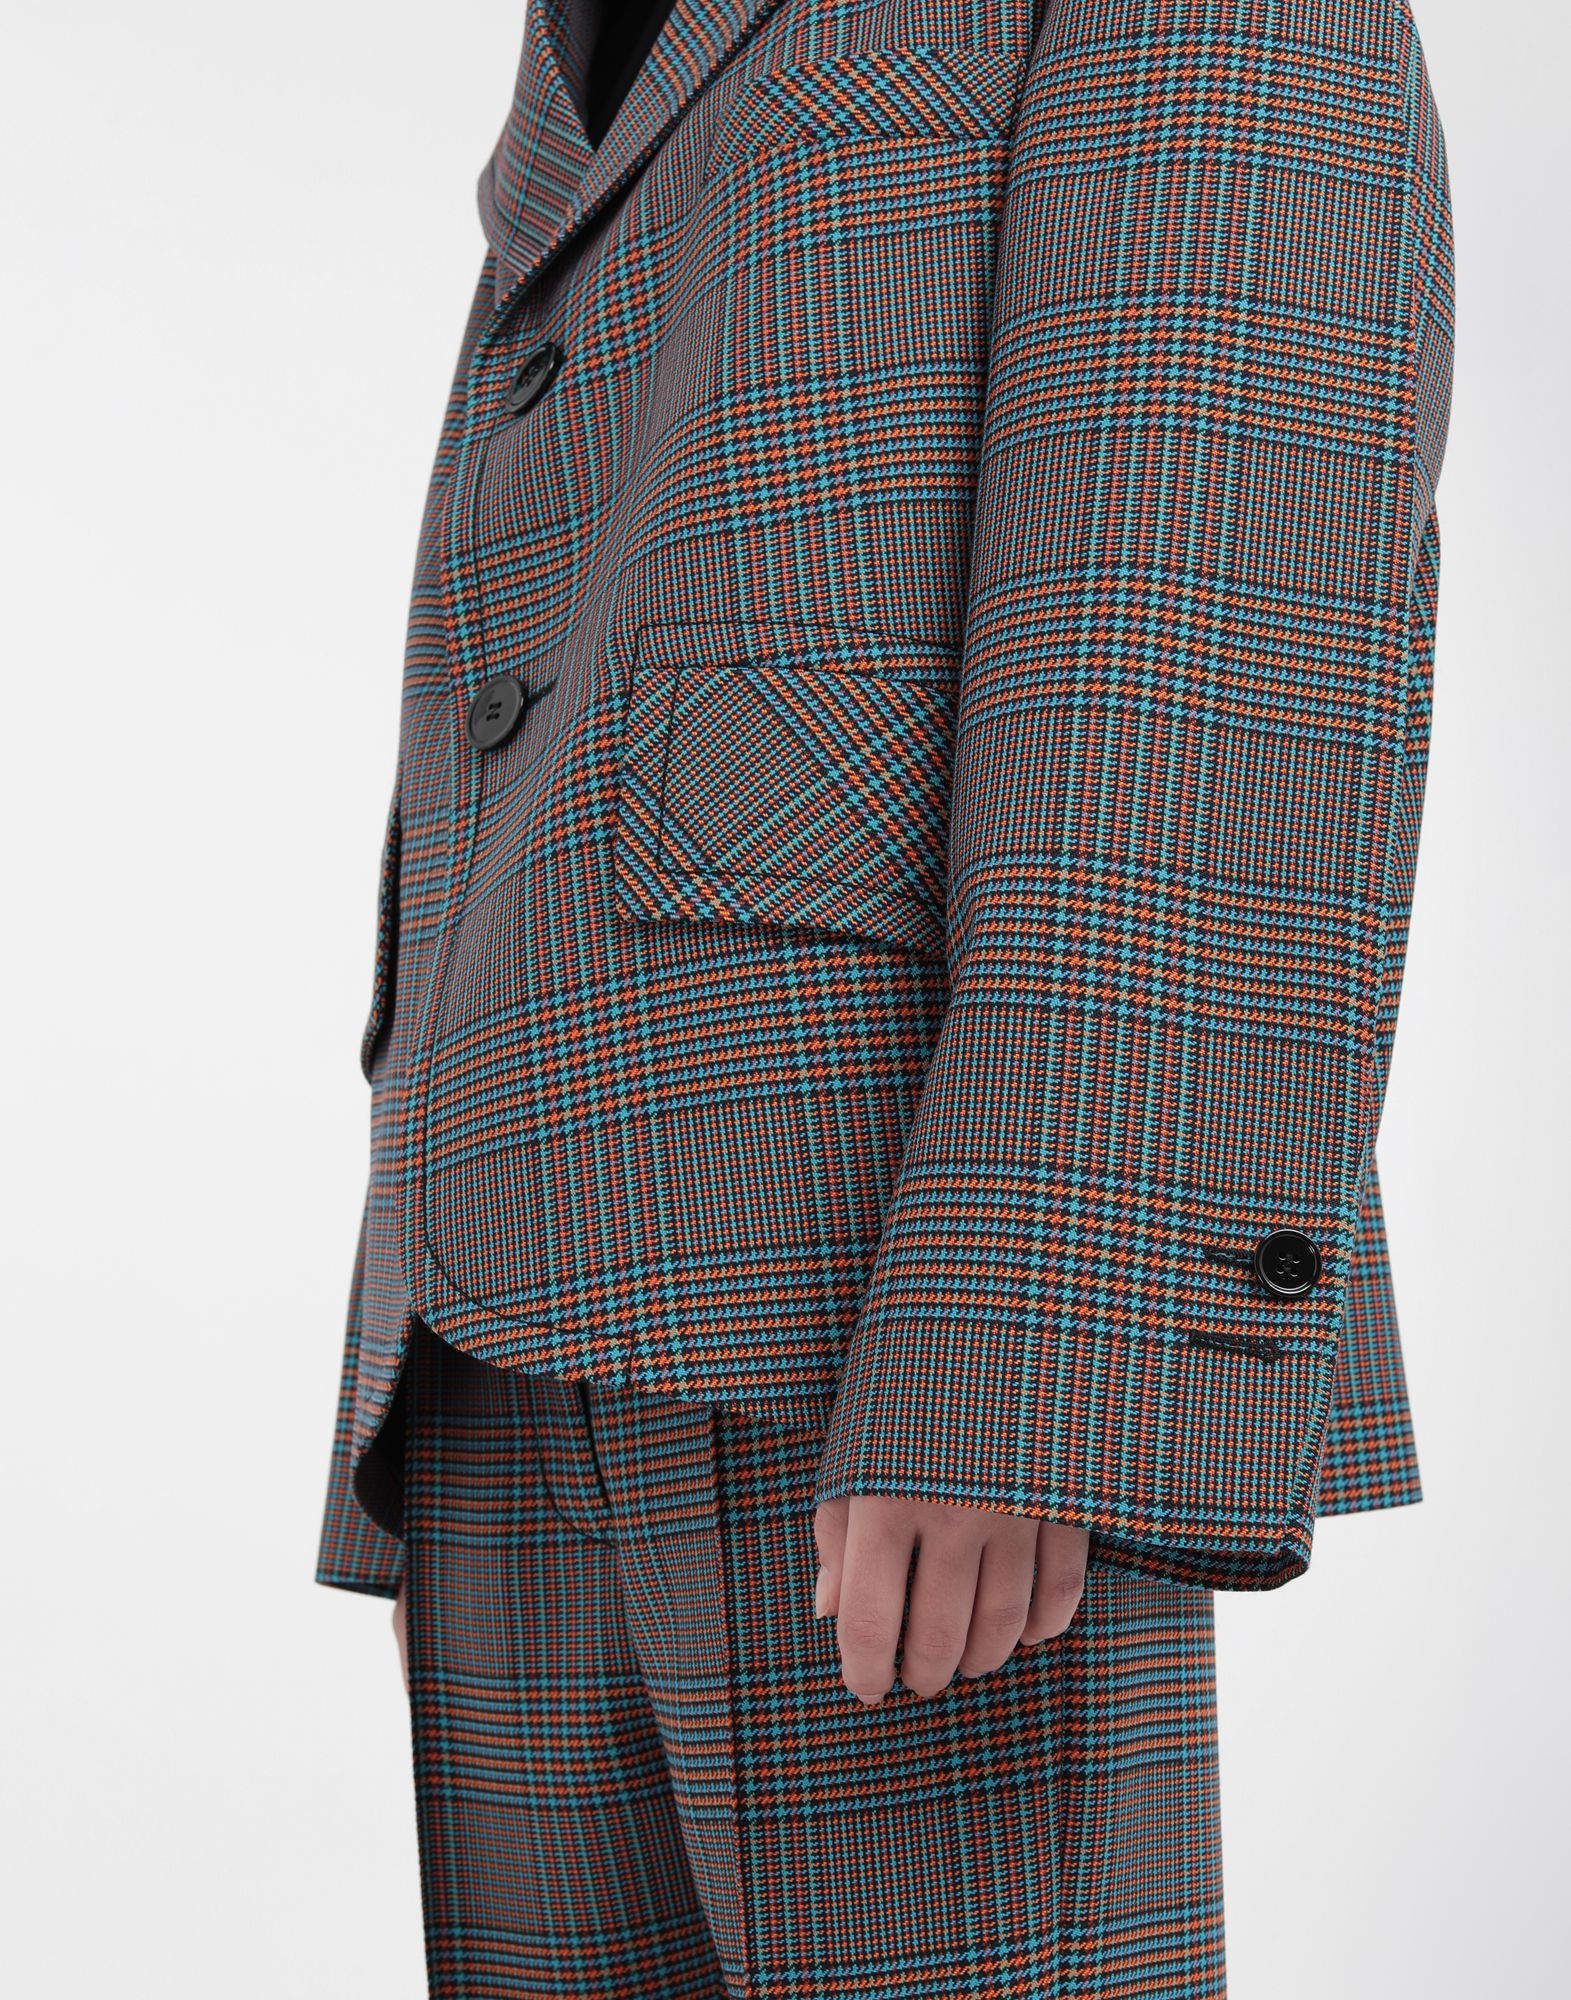 MM6 MAISON MARGIELA Oversized checked wool jacket Jacket Woman a